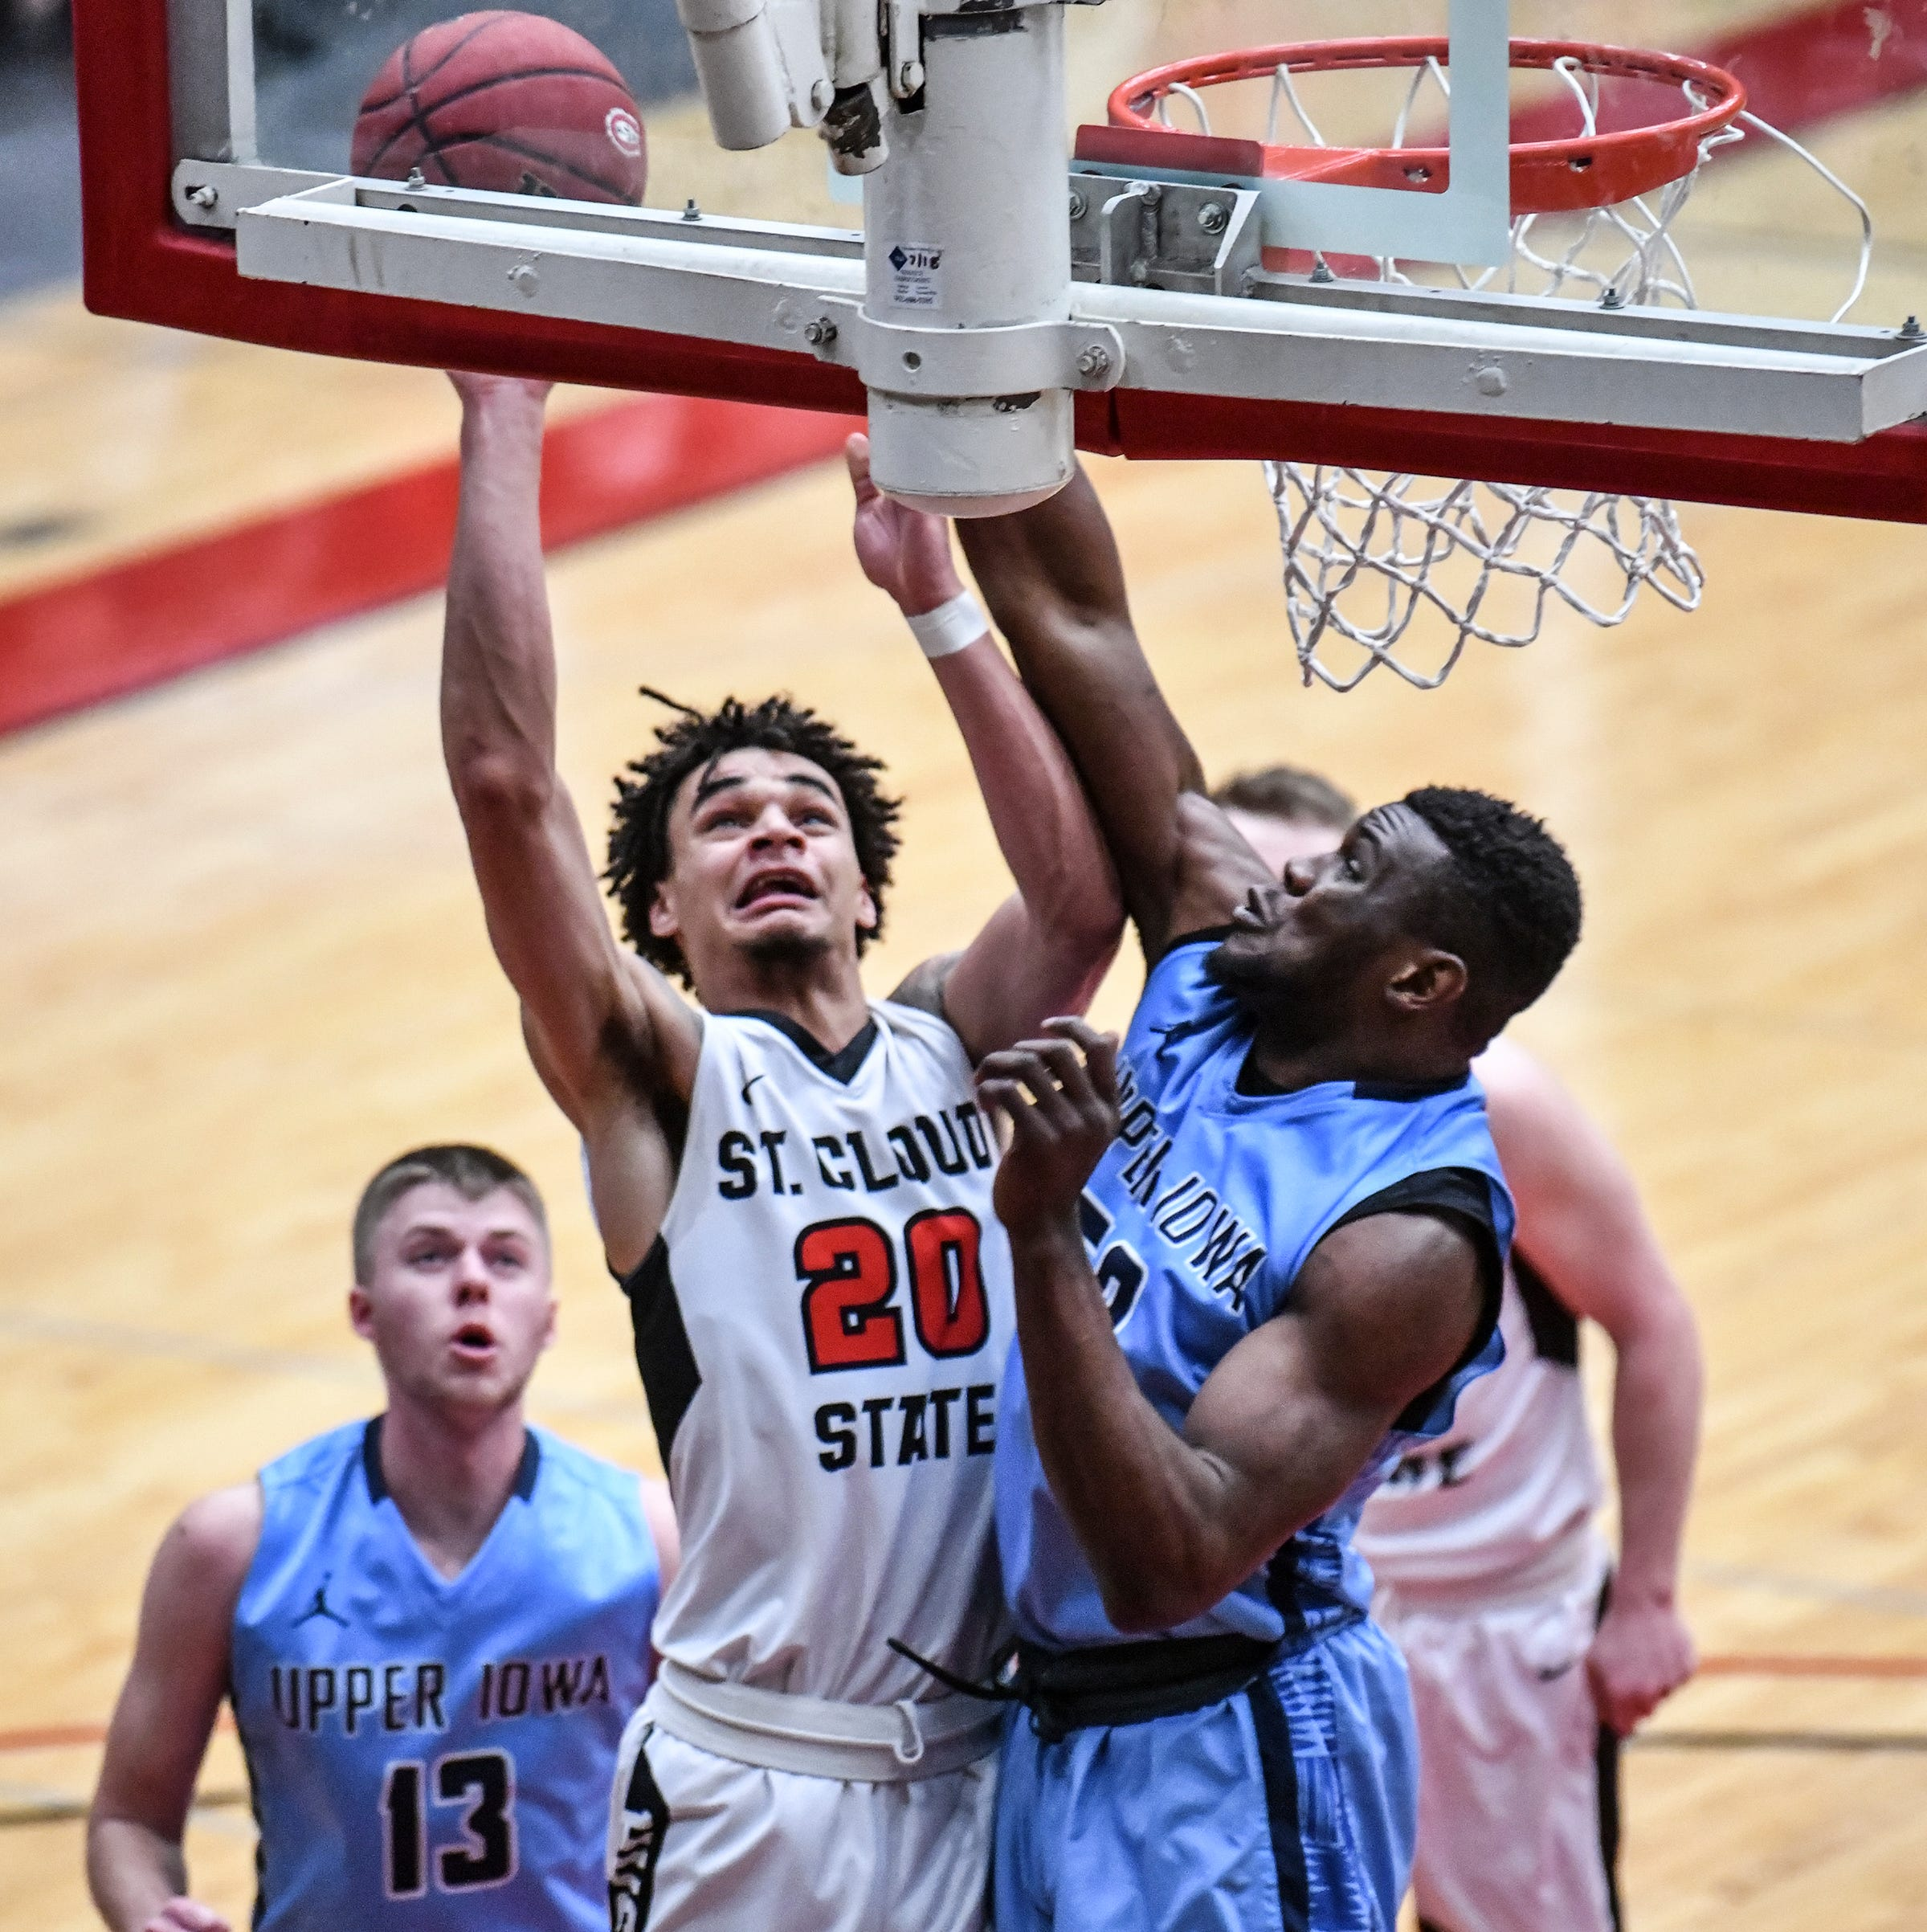 Huskies make second straight NCAA DII hoops tourney